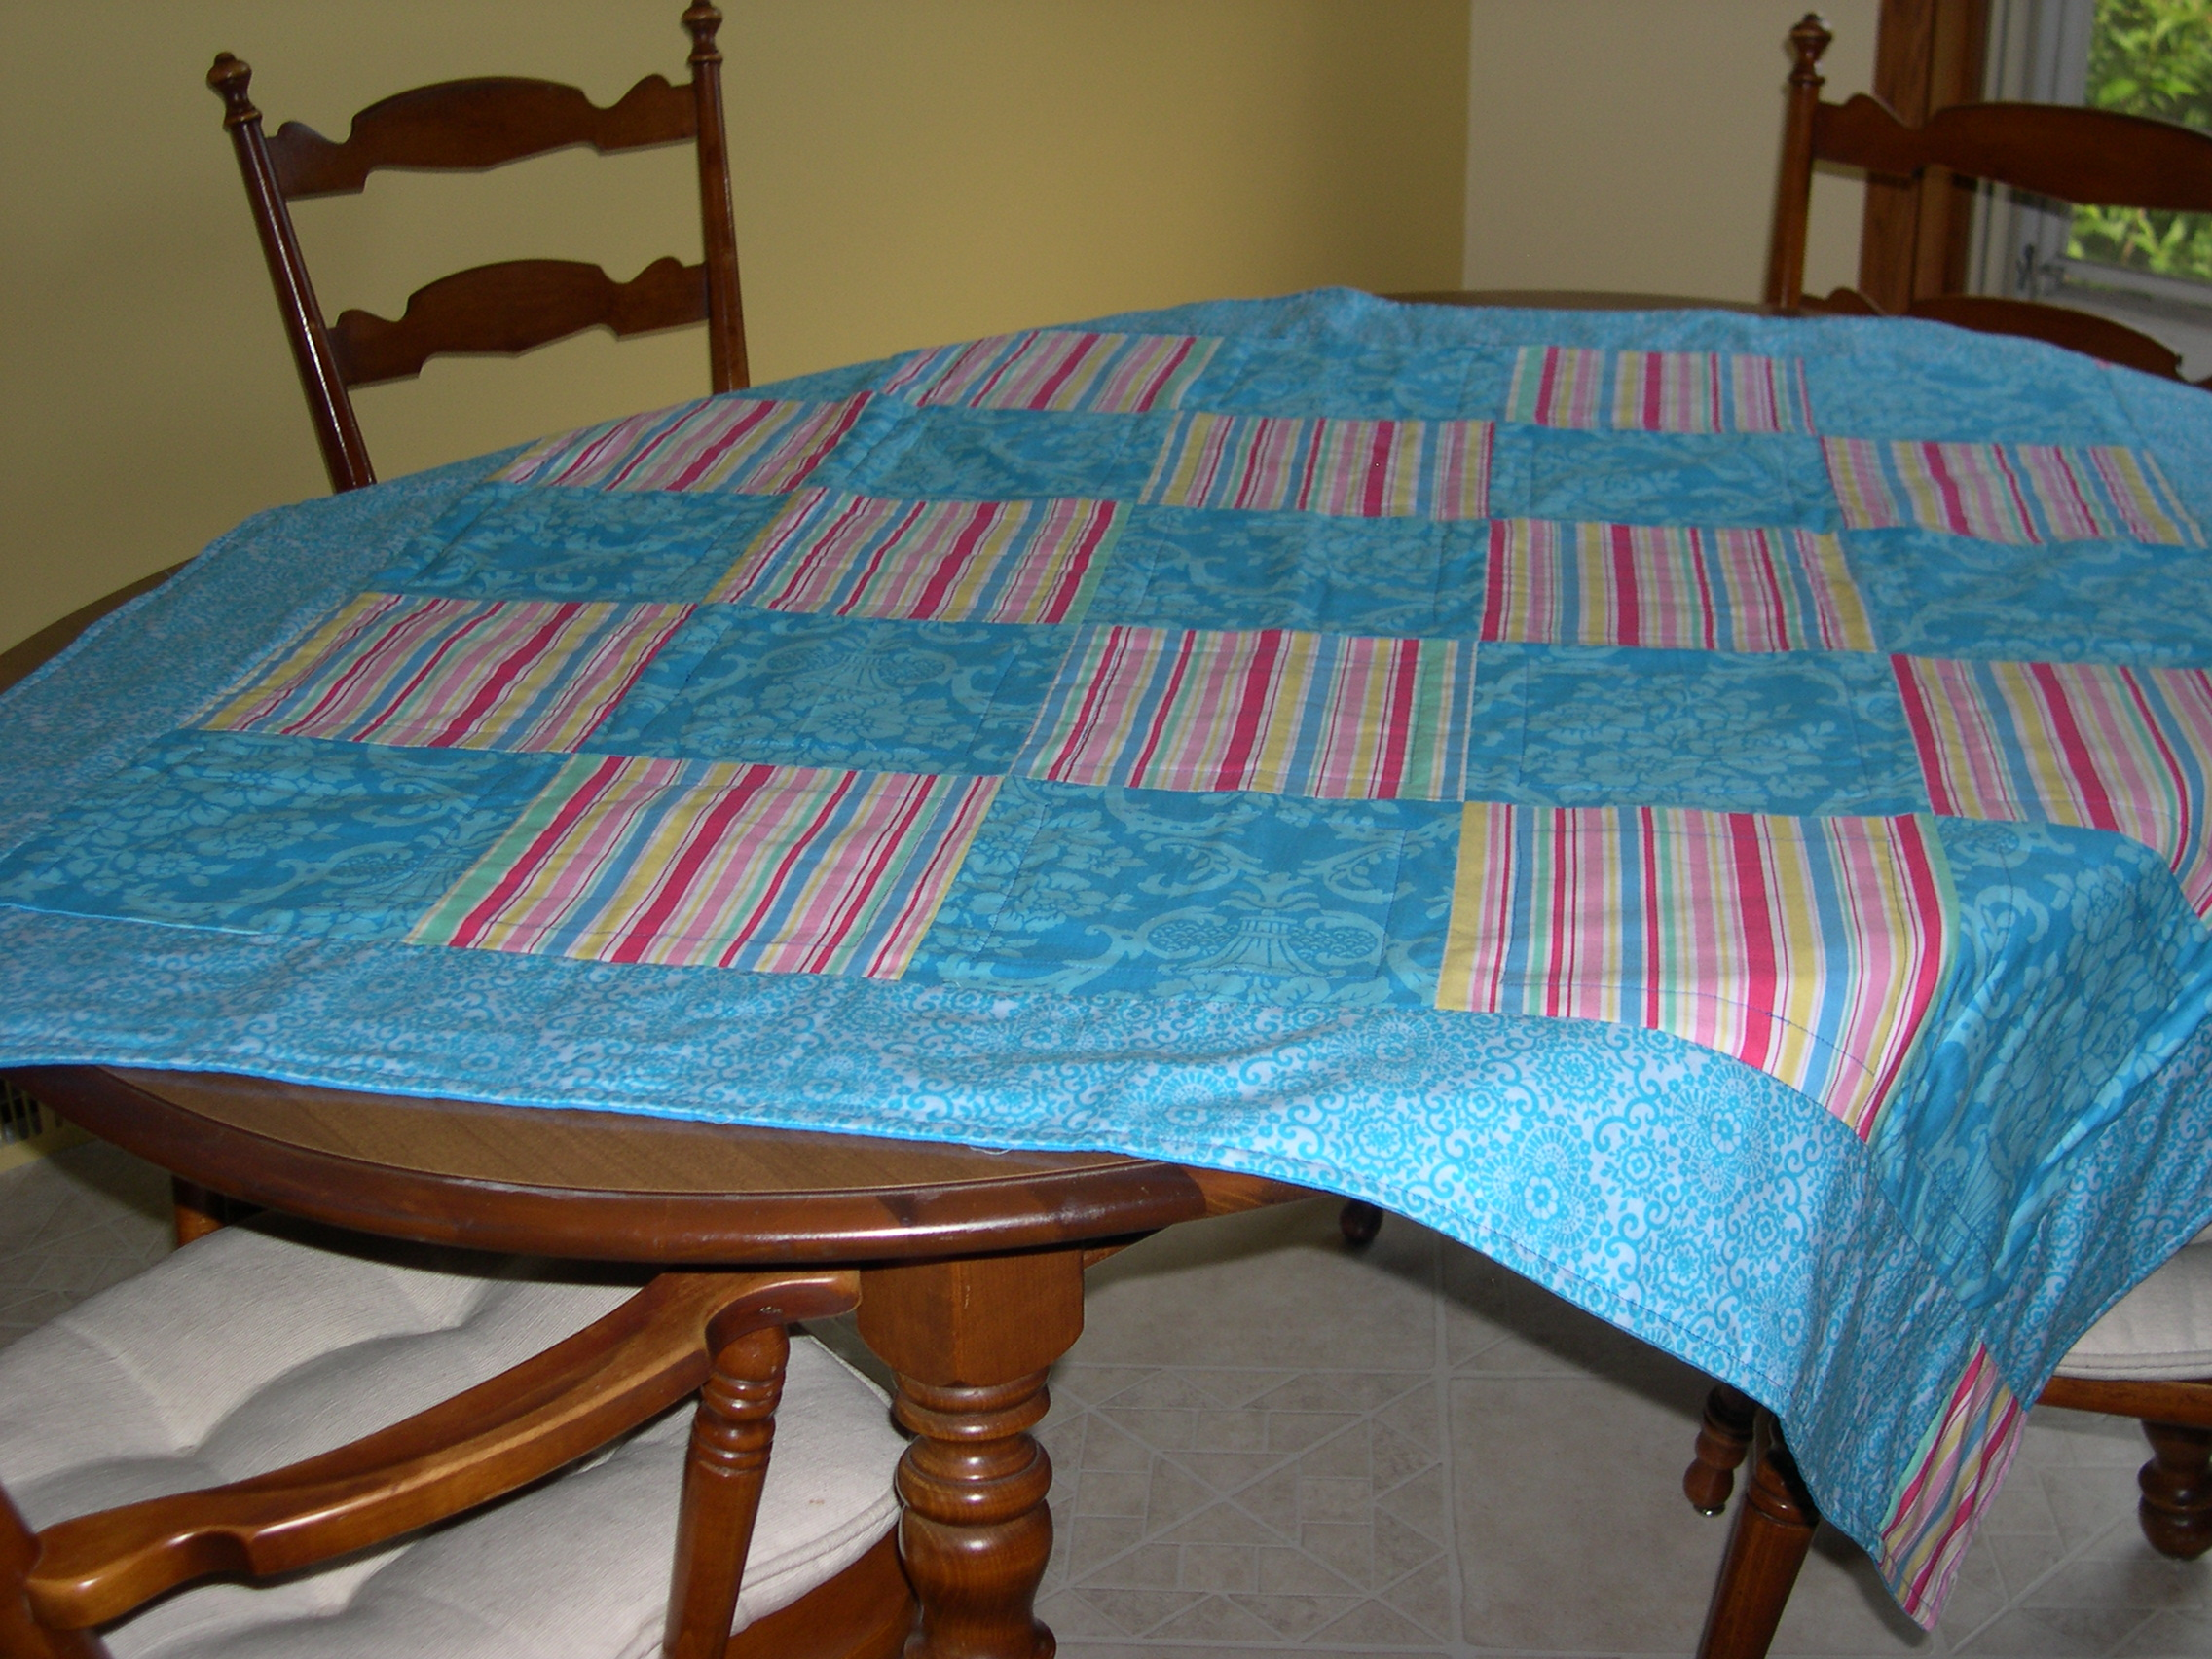 new tablecloth